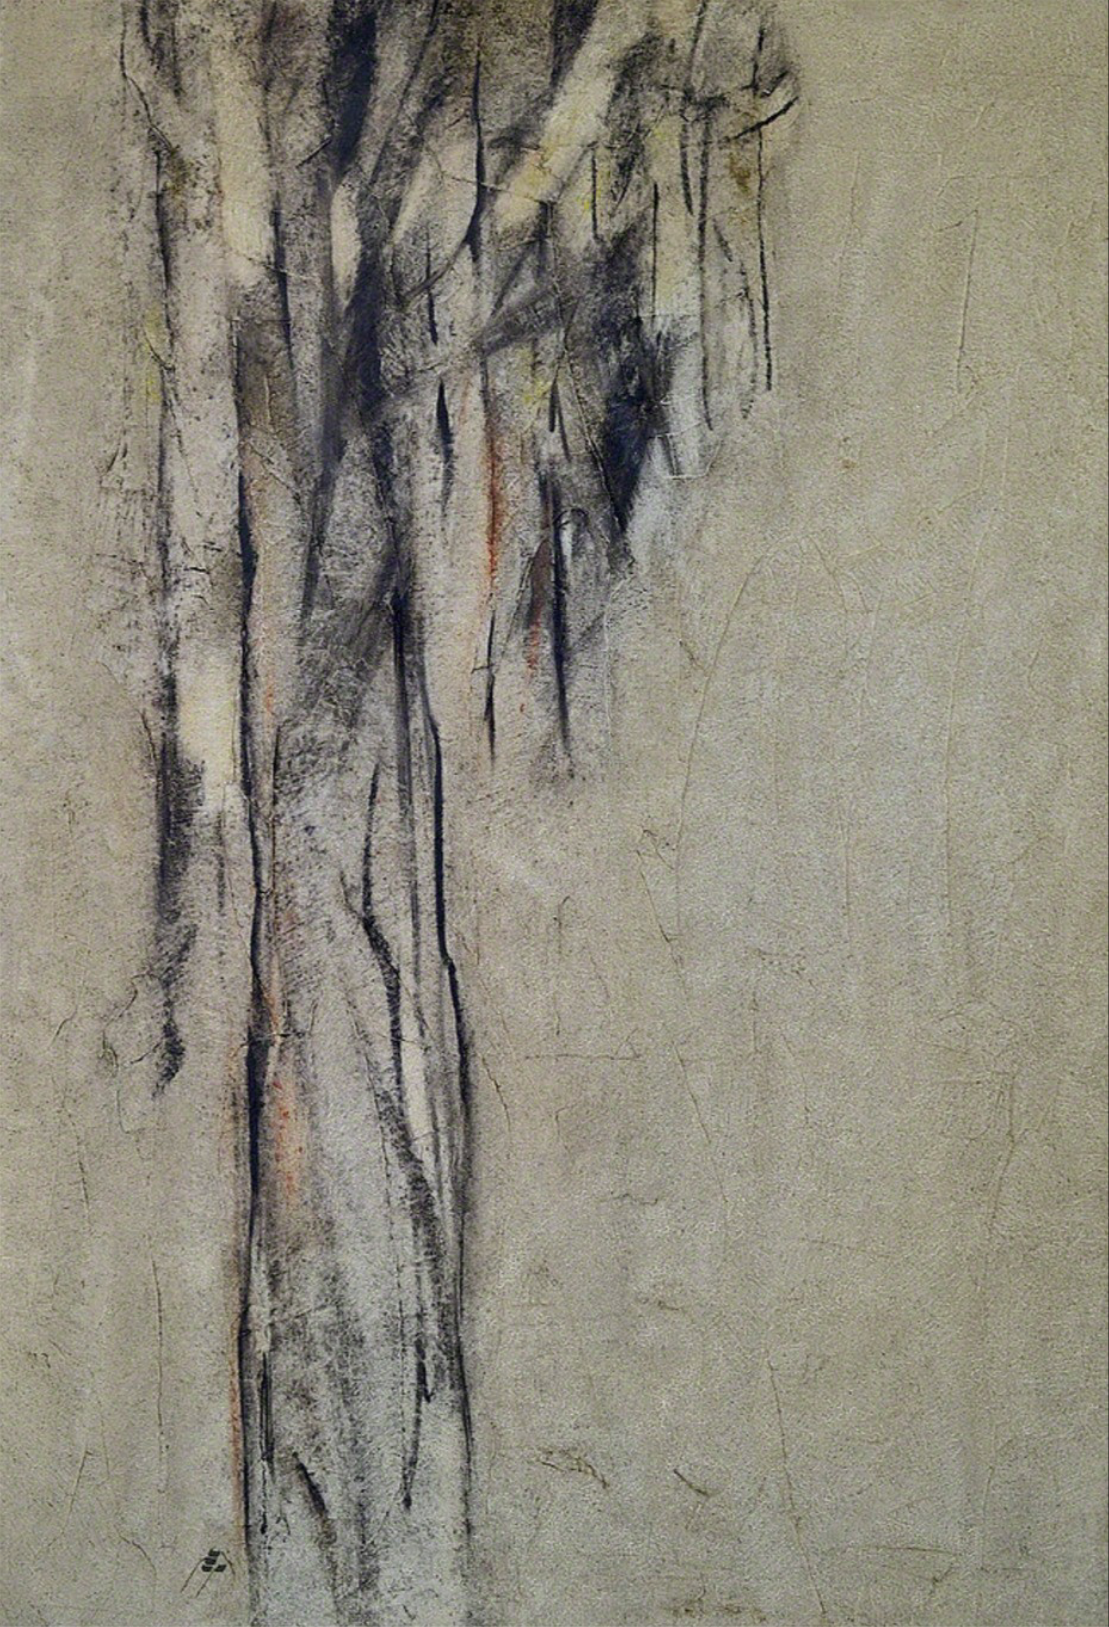 Sohrab Sepehri, Untitled, oil on canvas, 132 x 90 cm, circa 1960